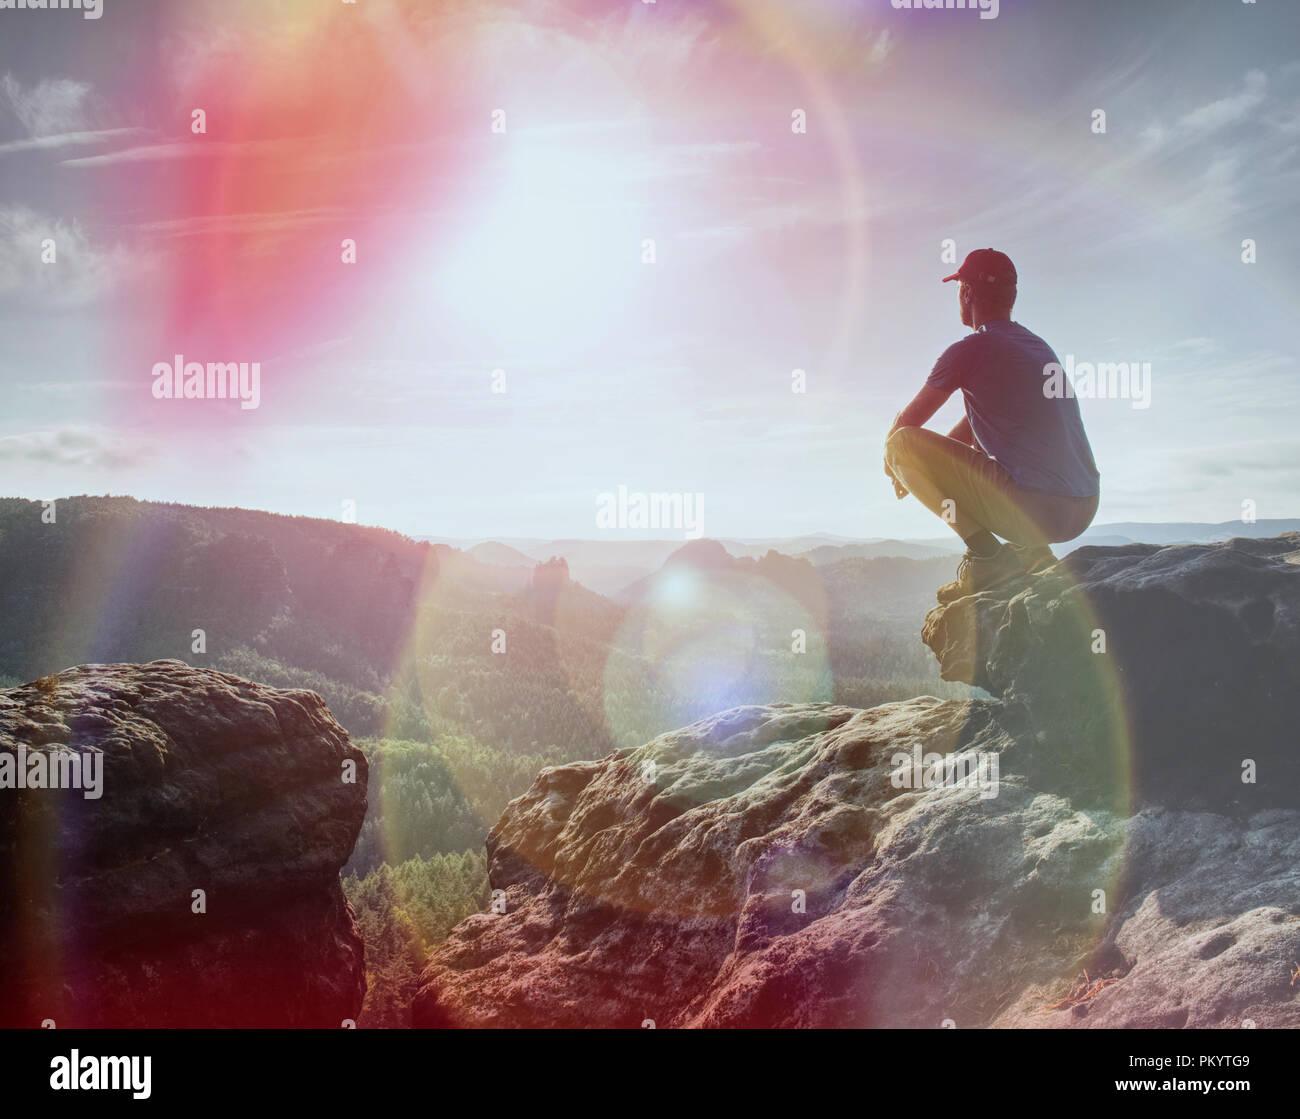 Wanderer beobachten, Sonne am Horizont. Schöner Moment, das Wunder der Natur. Bunte Nebel im Tal. Menschen wandern. Stockbild